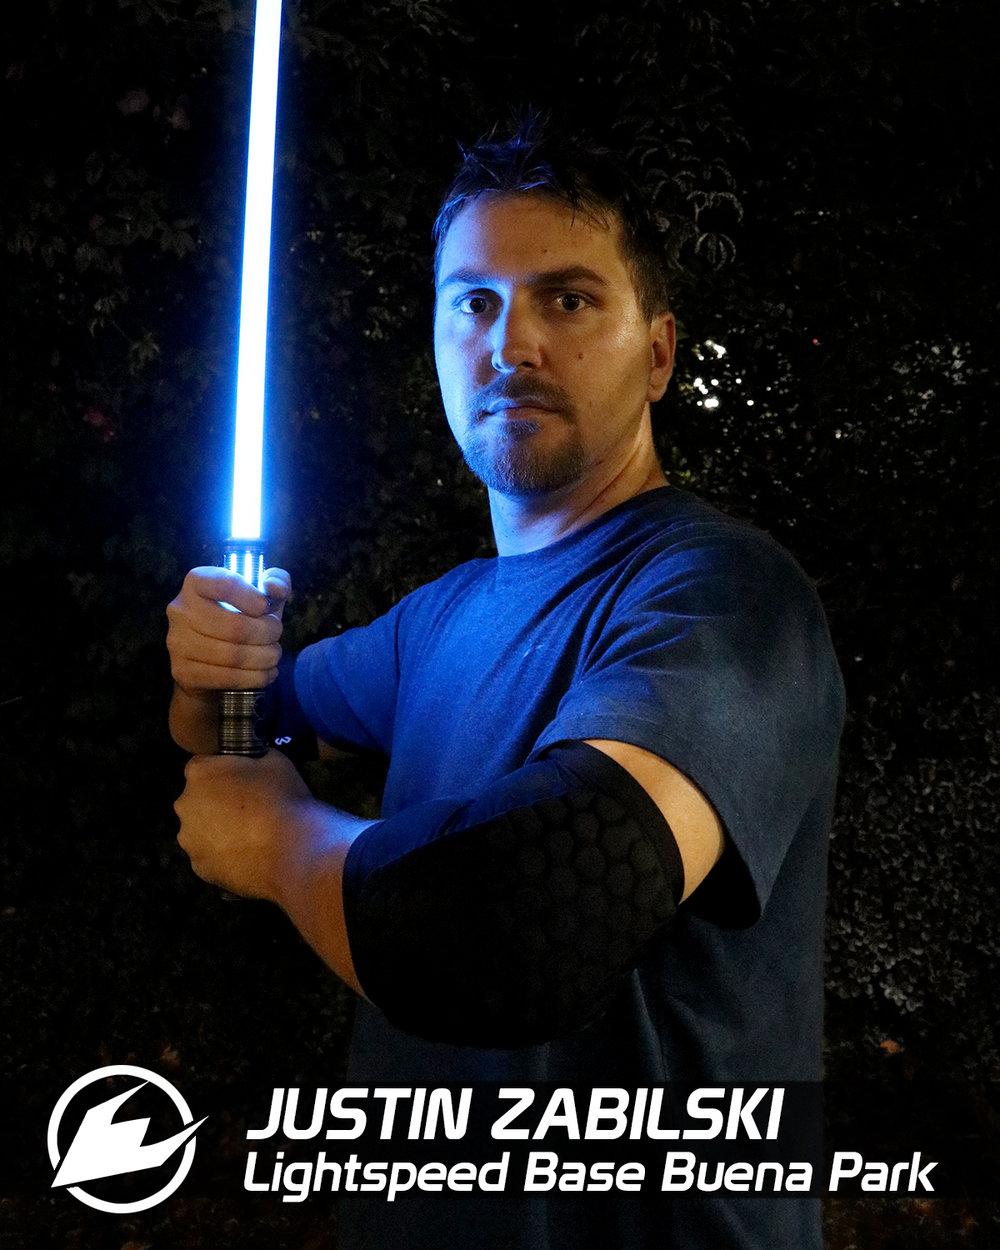 JustinZabilski180922.jpg